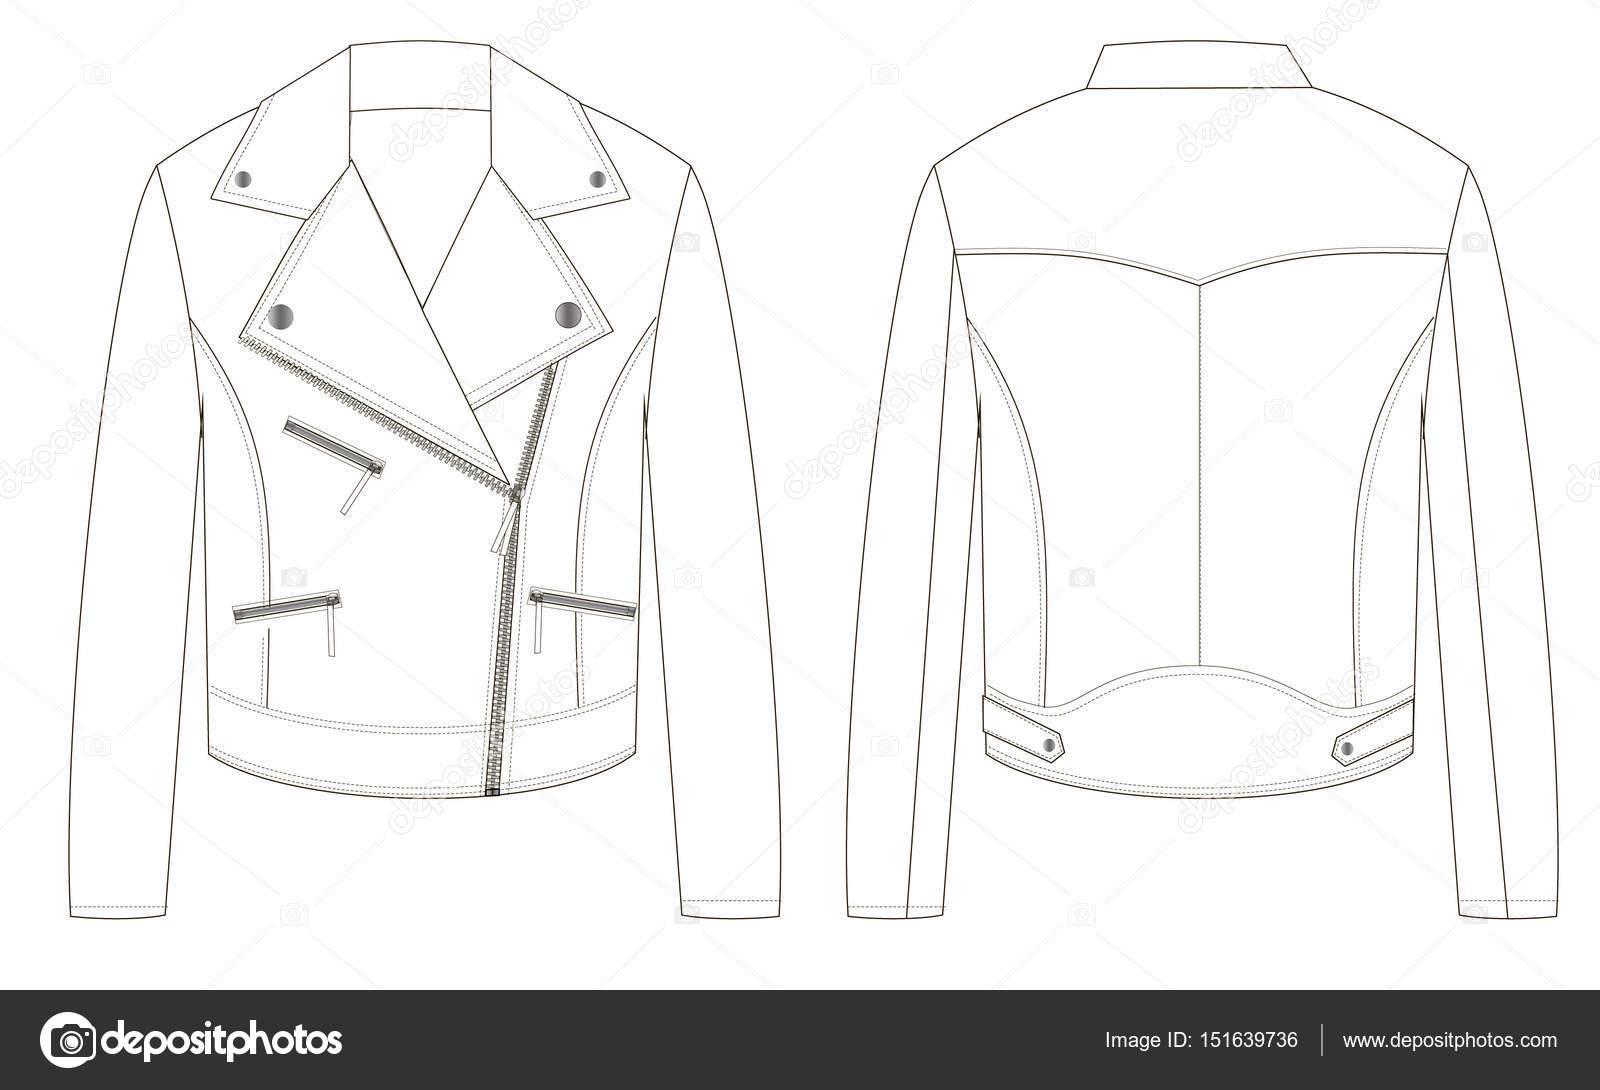 e3ade1dcbae8a Chaqueta Cuero Biker Partes Delanteras Traseros Dibujo Técnico Contorno —  Vector ...